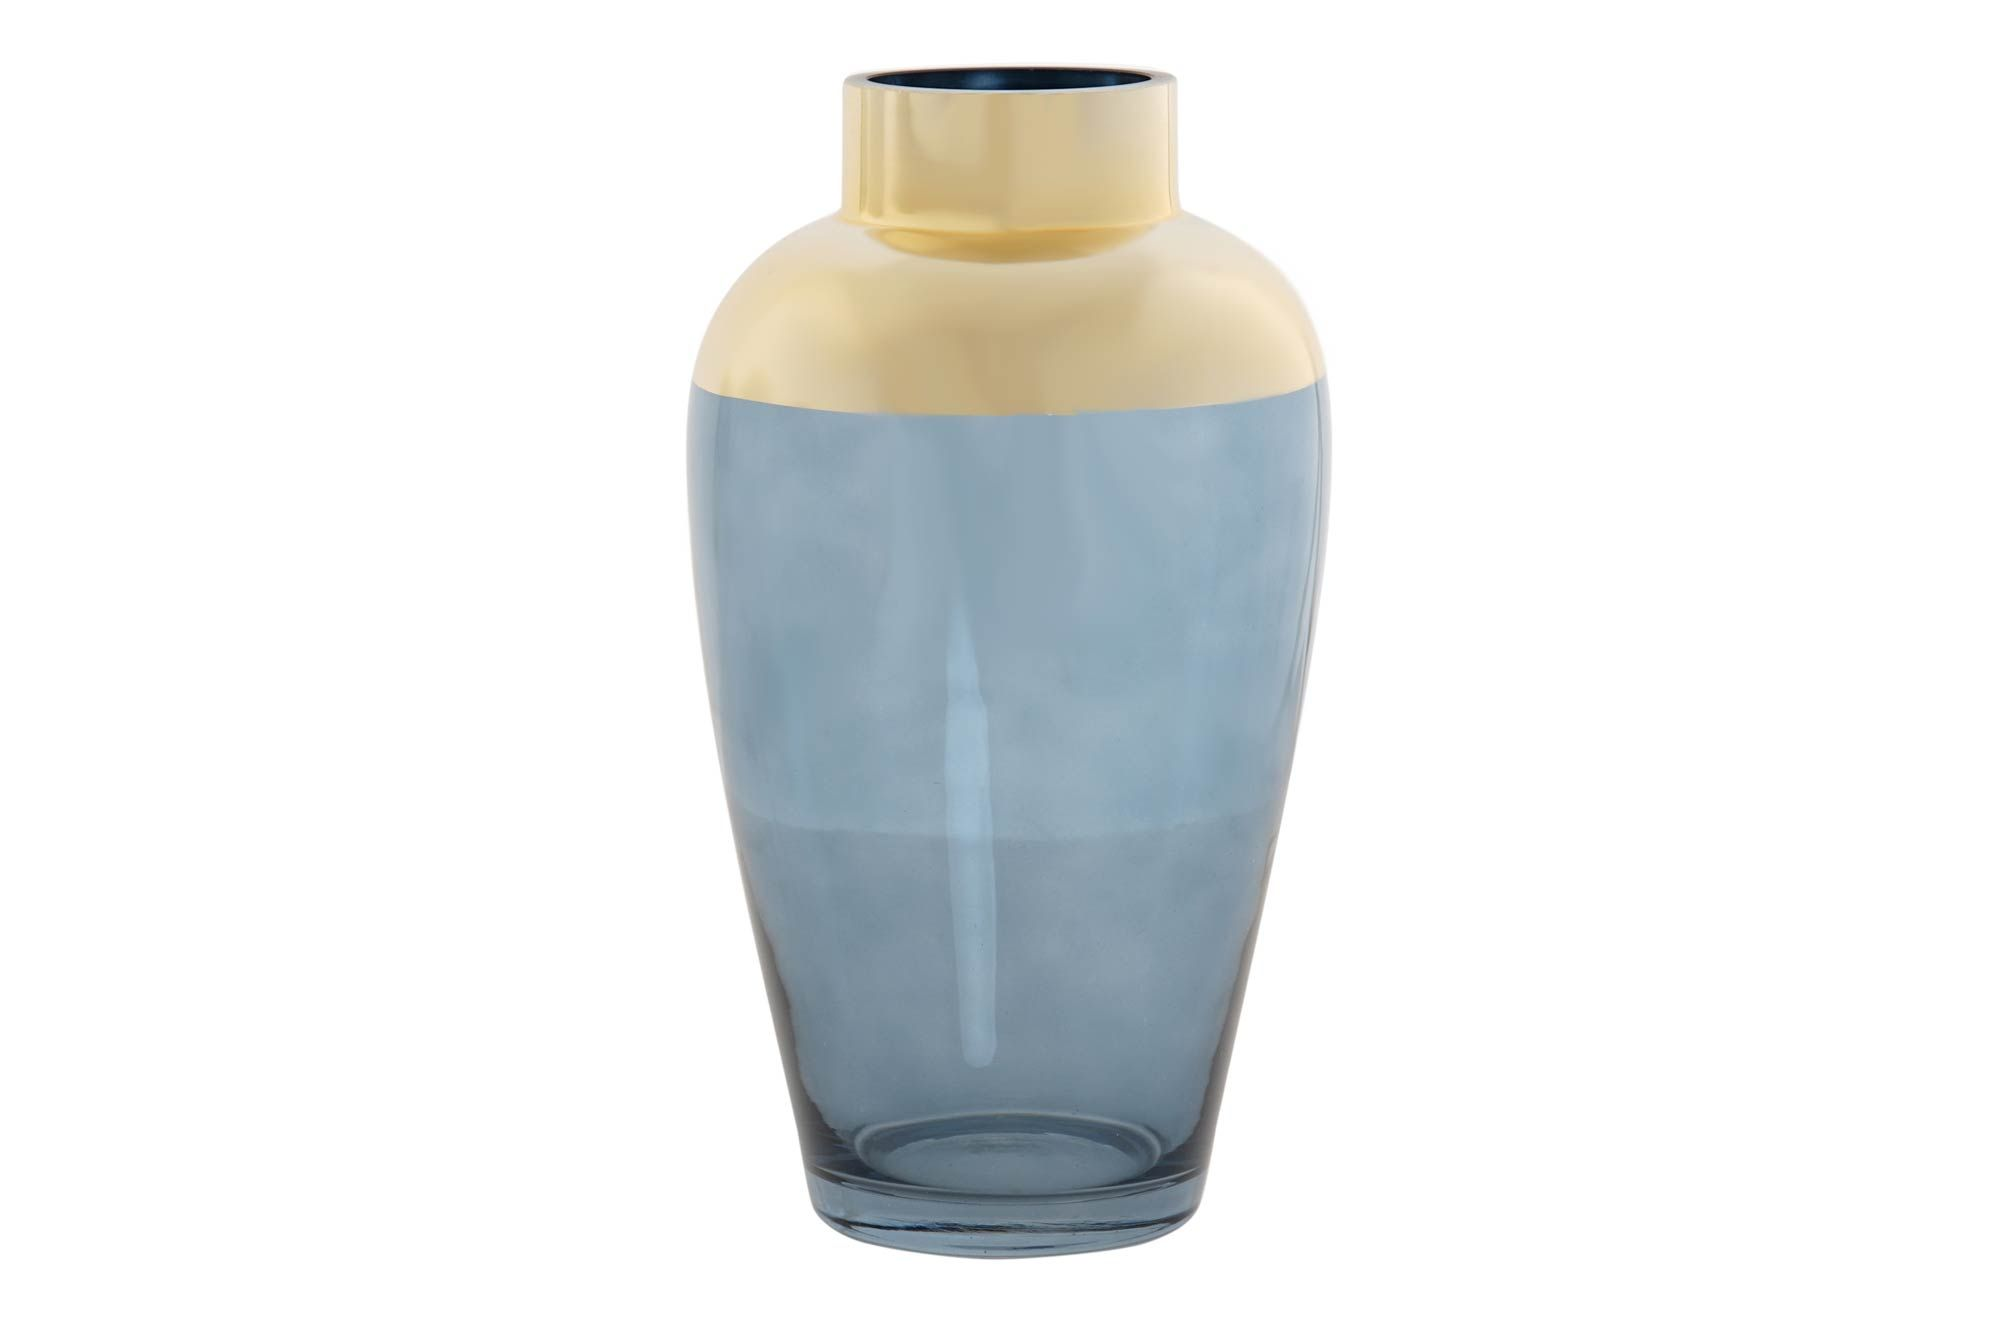 Glasvase i blå/guld